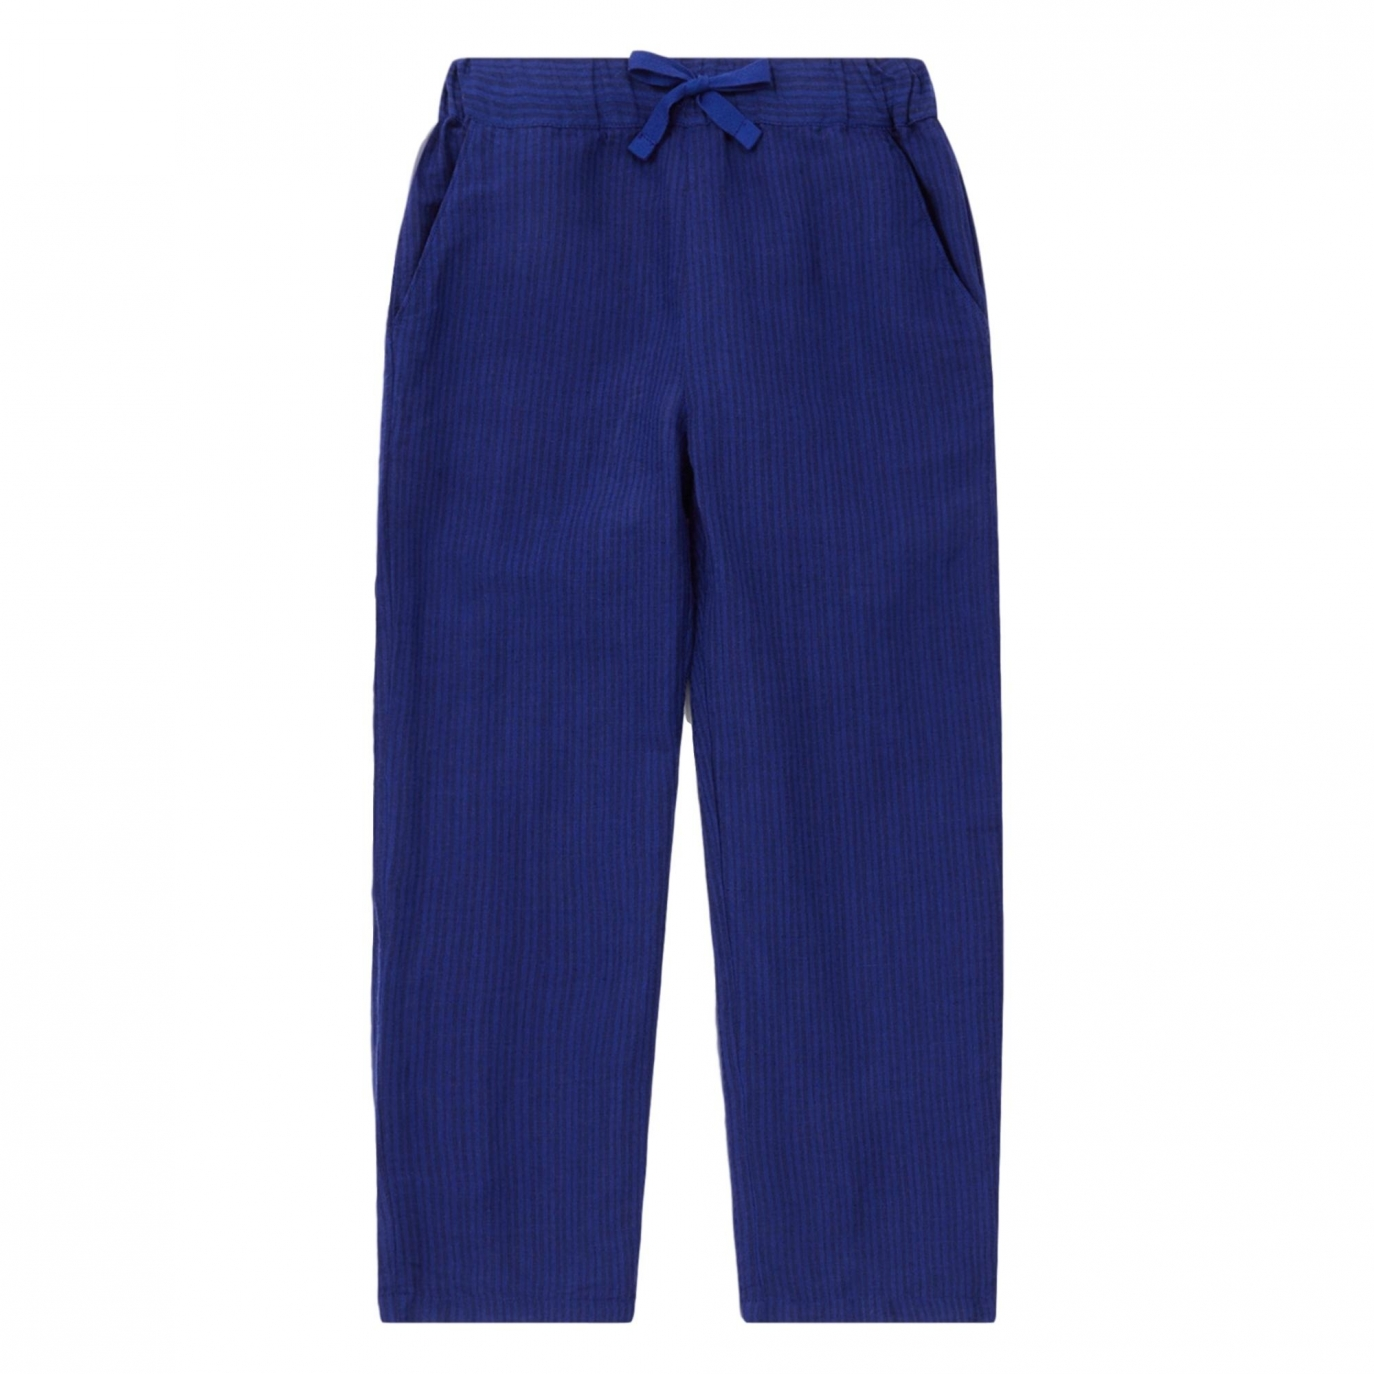 Bonton Spodnie Nortonr niebieskie